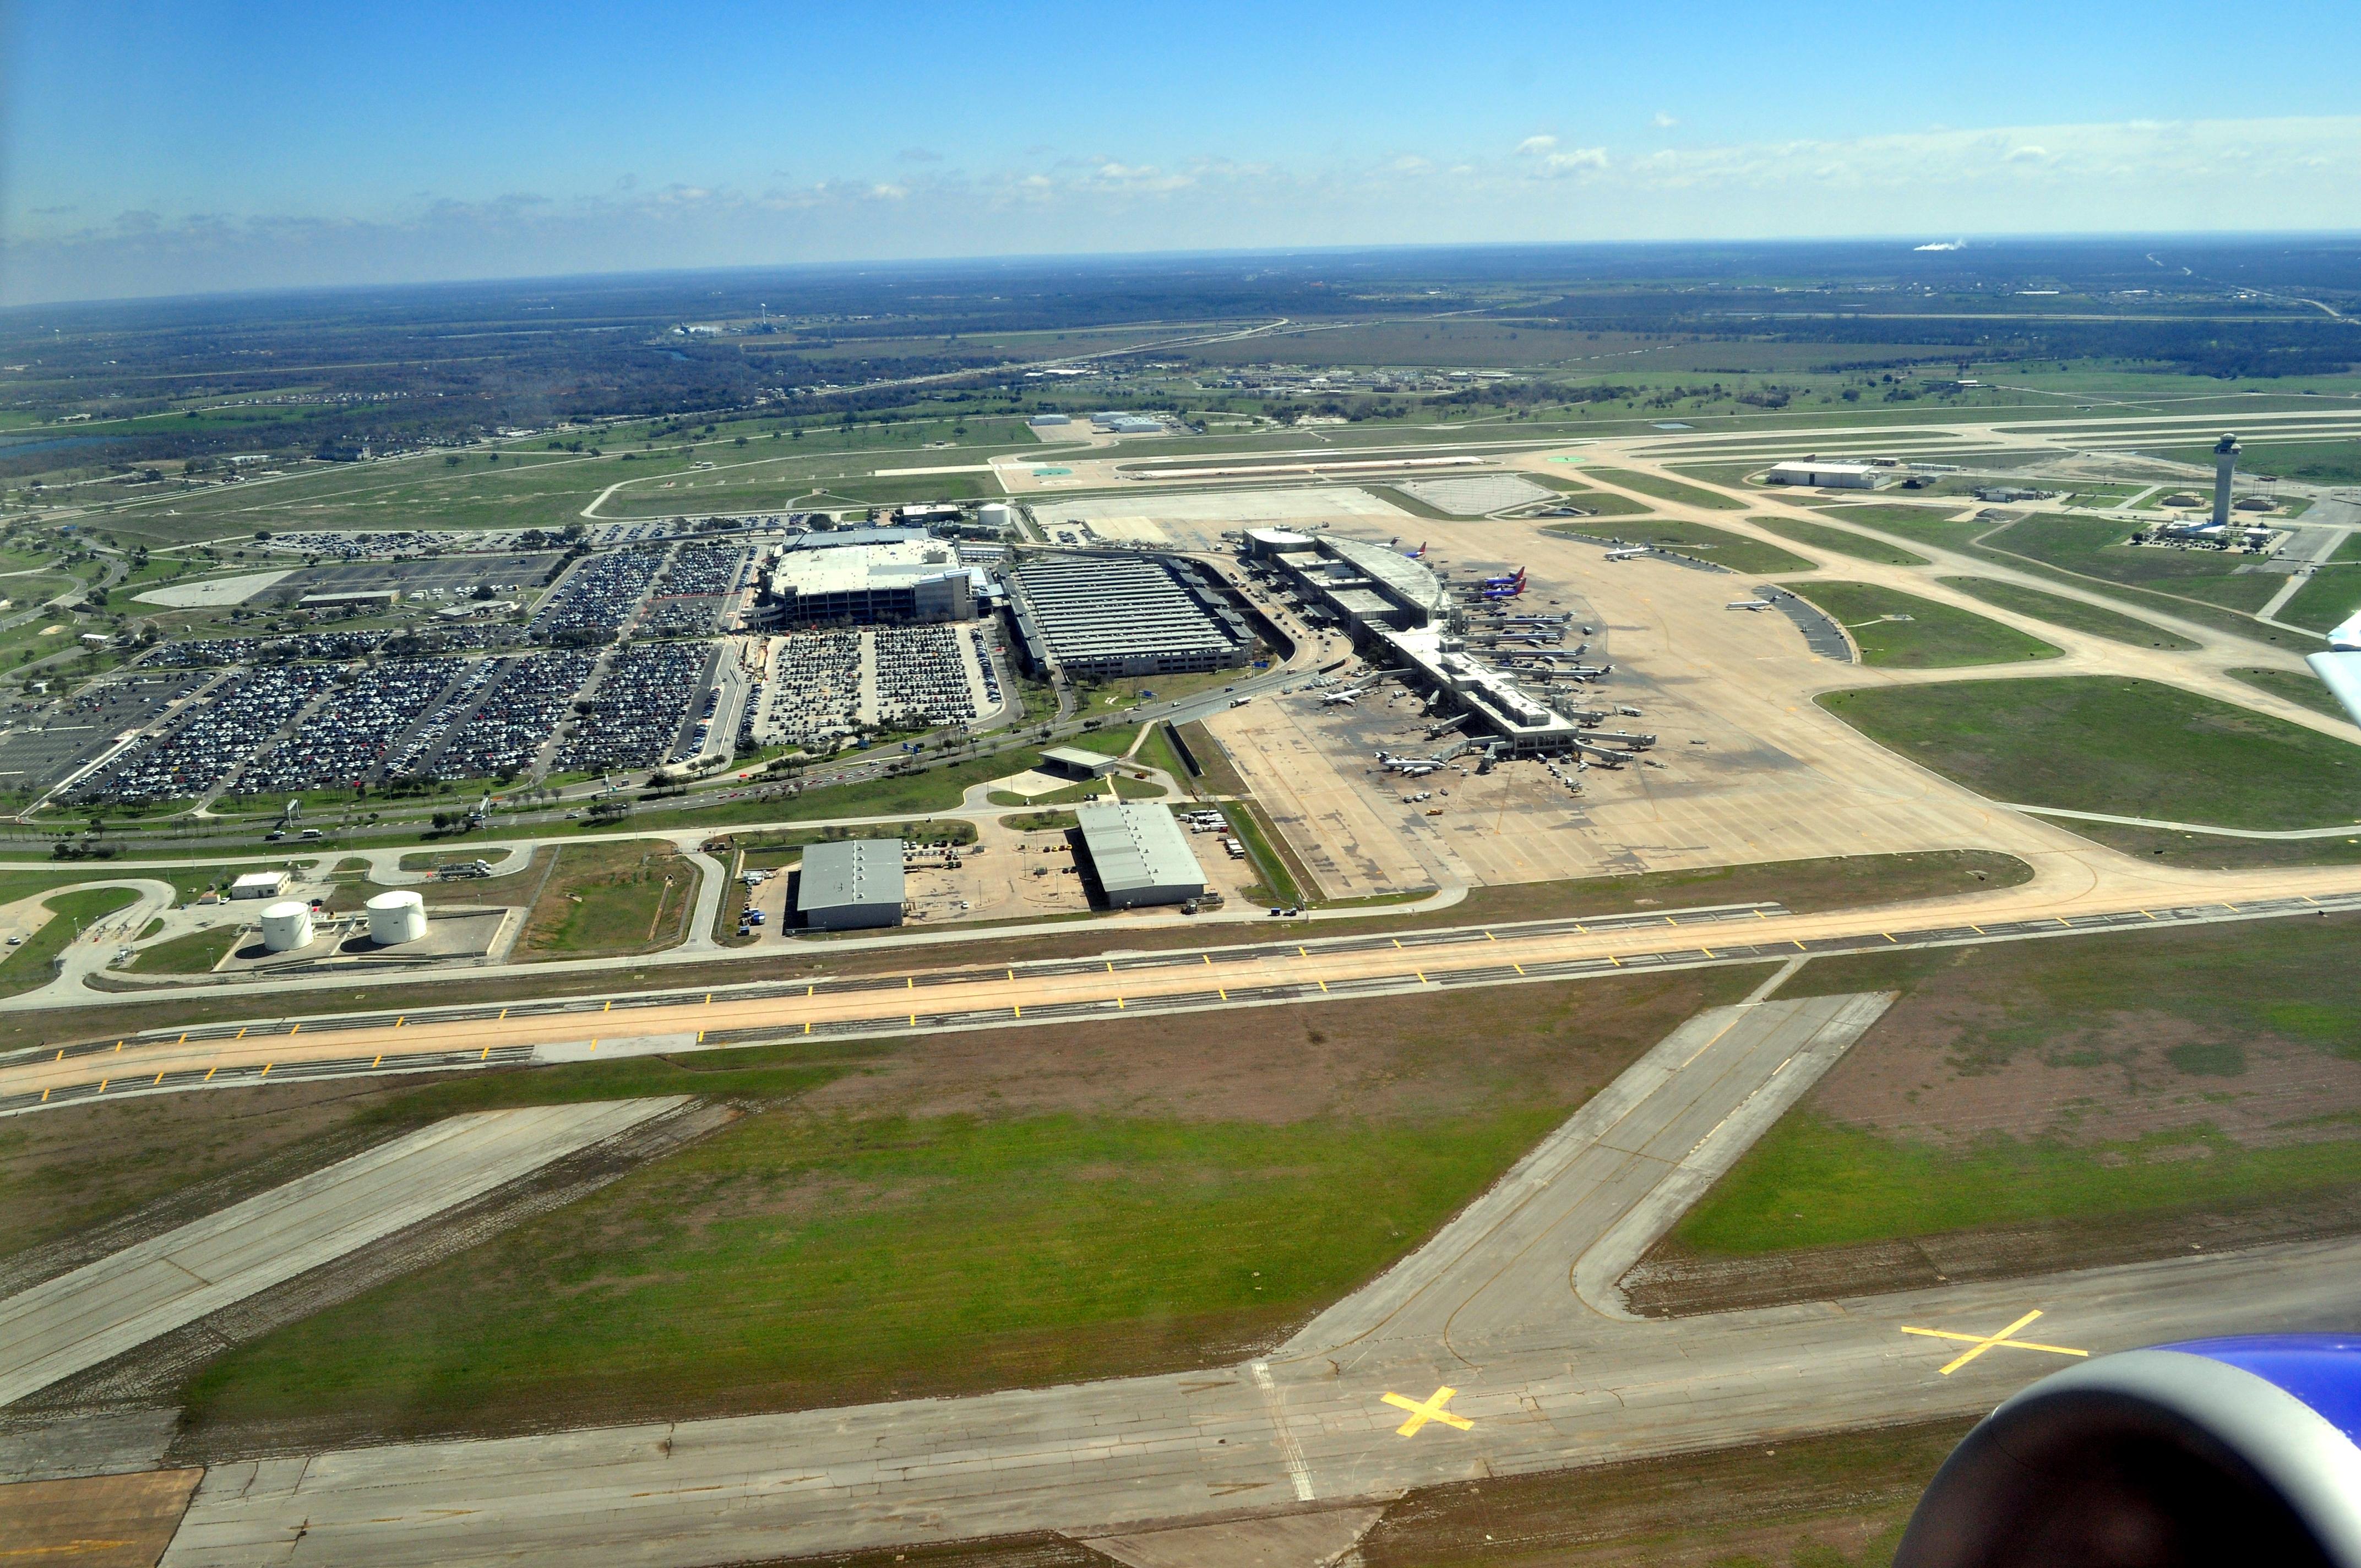 Austin Bergstrom International Airport Wikipedia